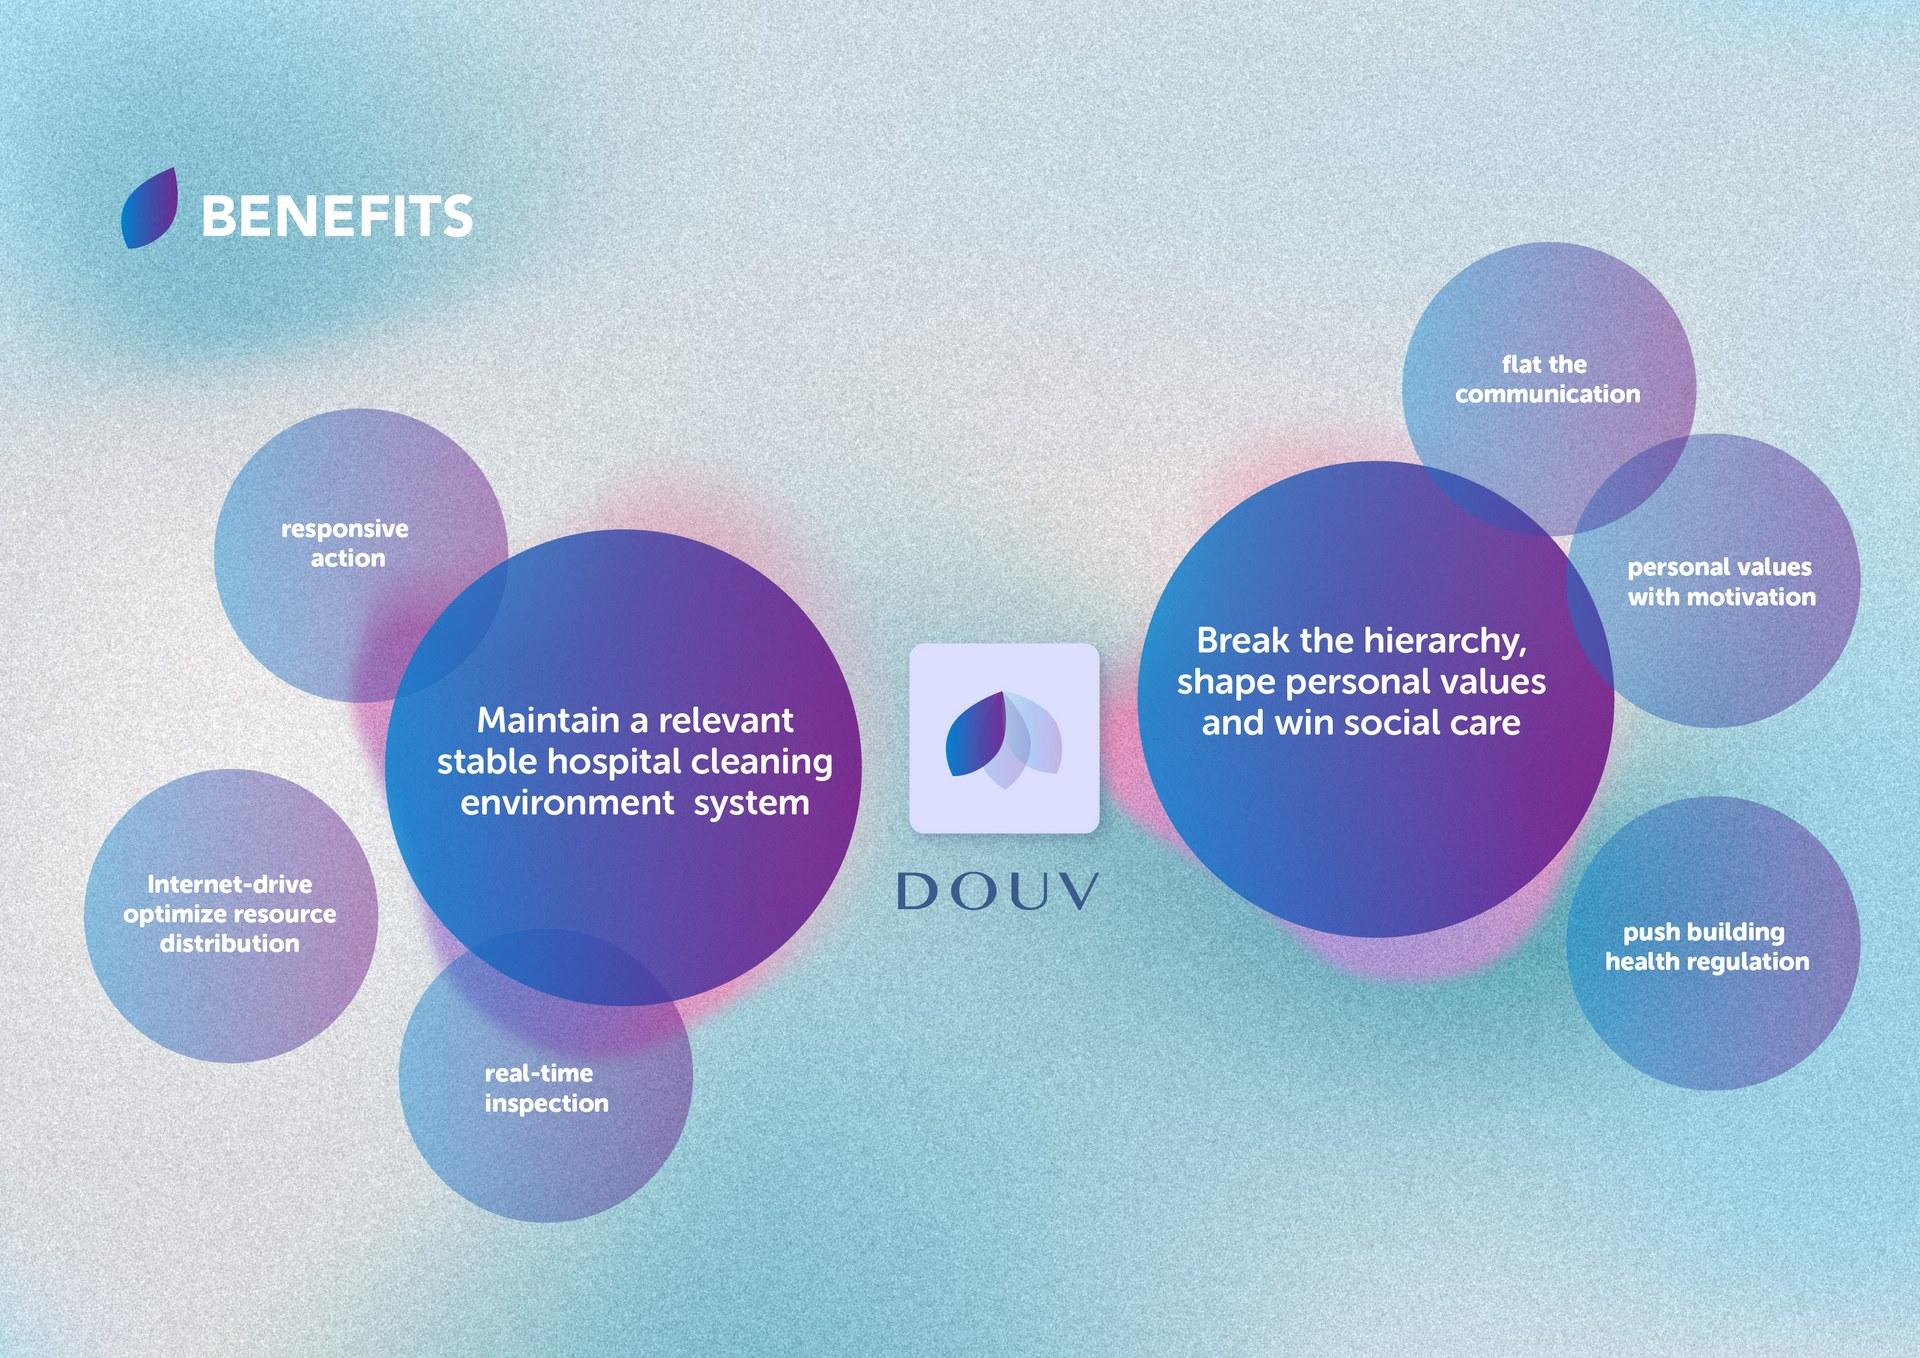 Benefits diagram